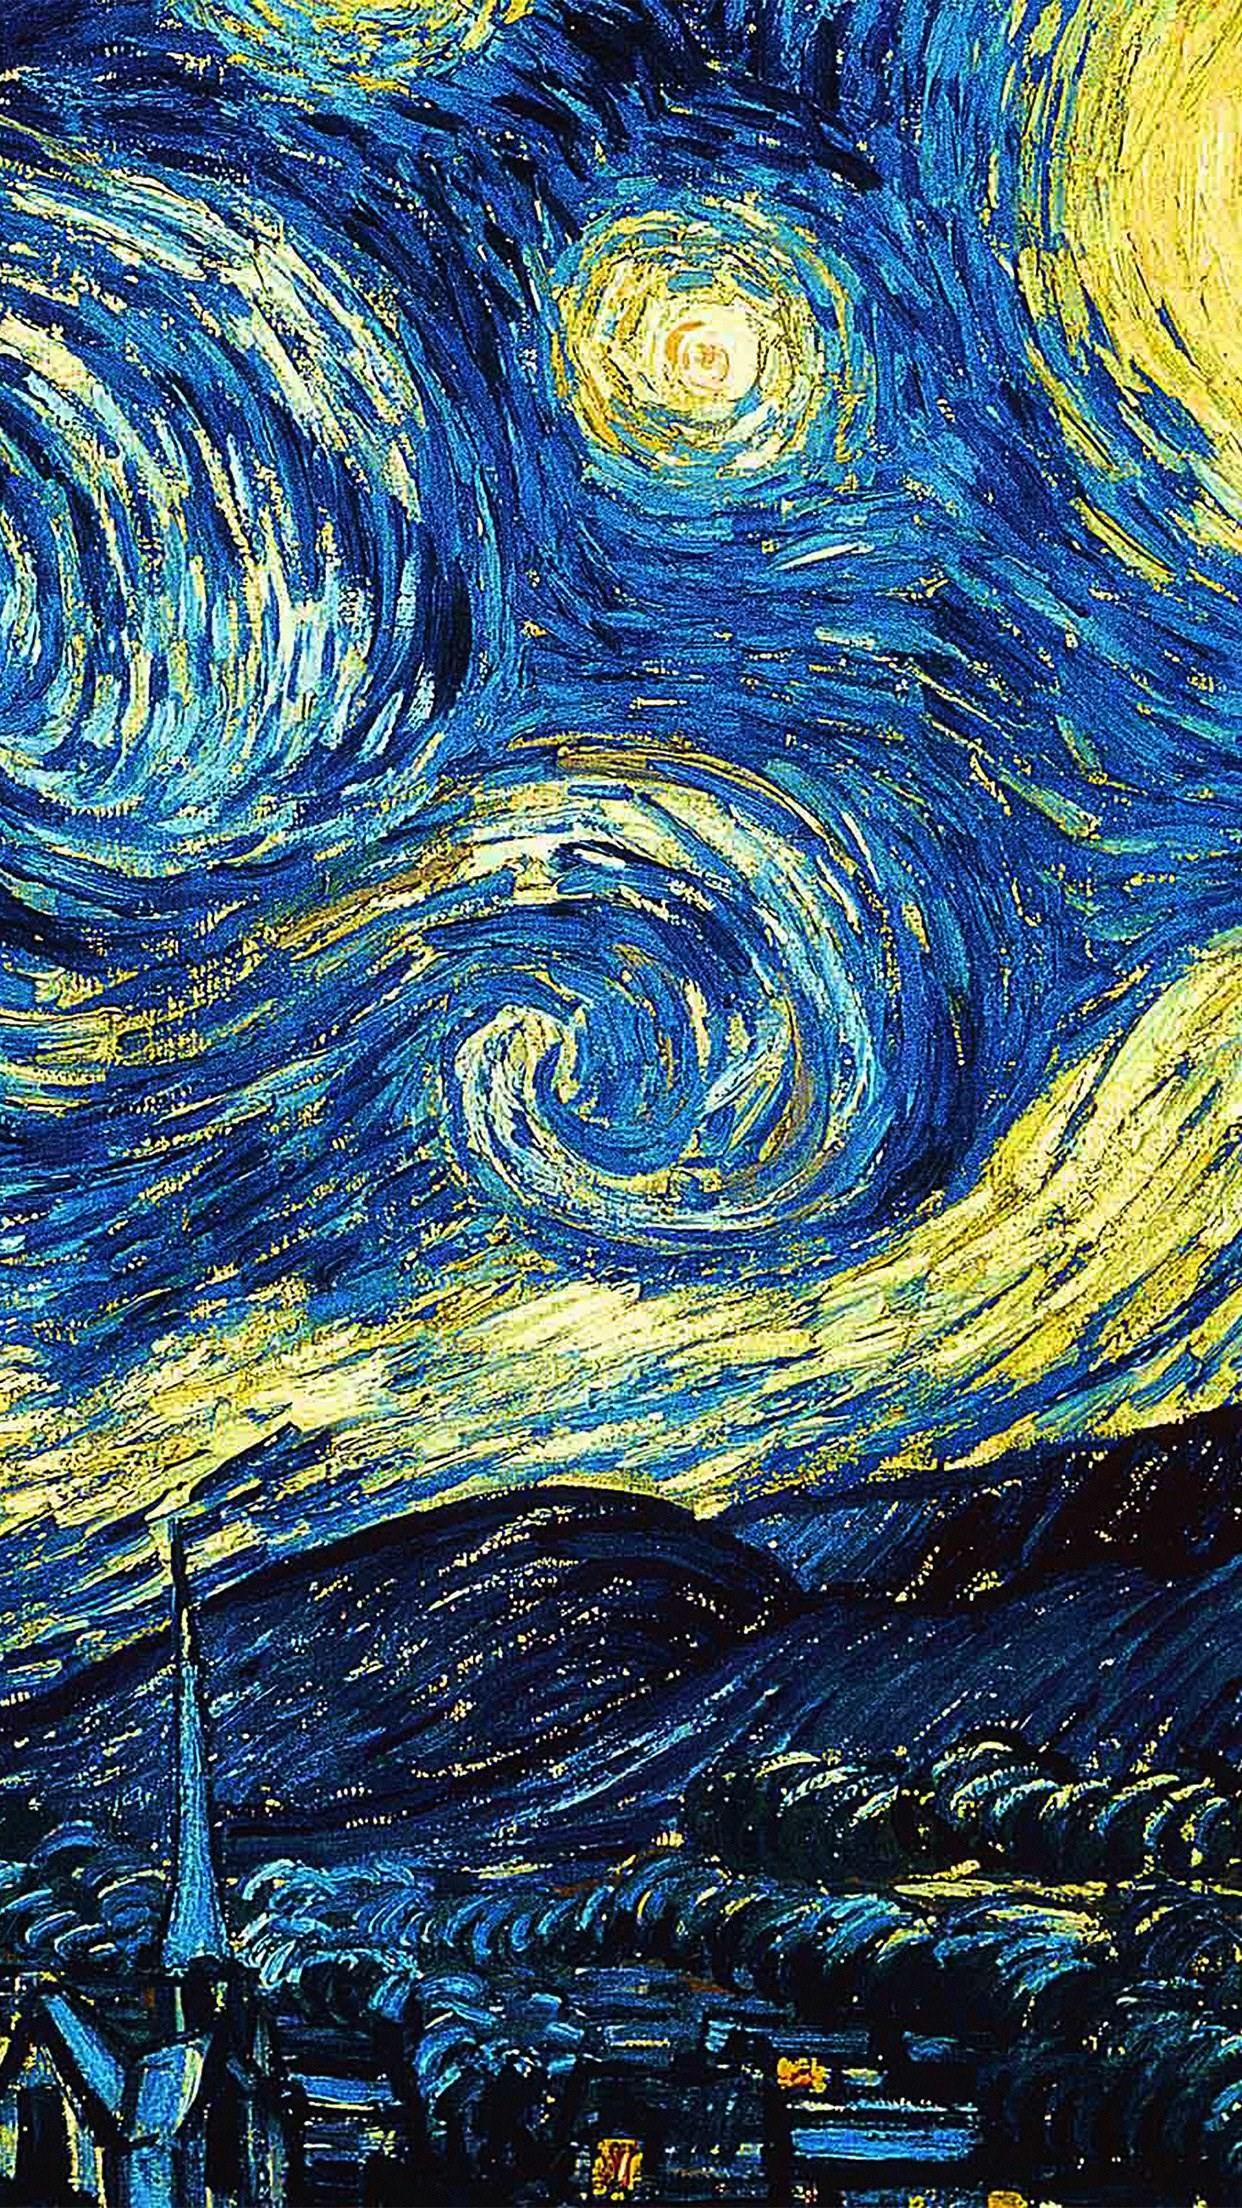 Doctor Who Van Gogh Wallpaper (55+ images)